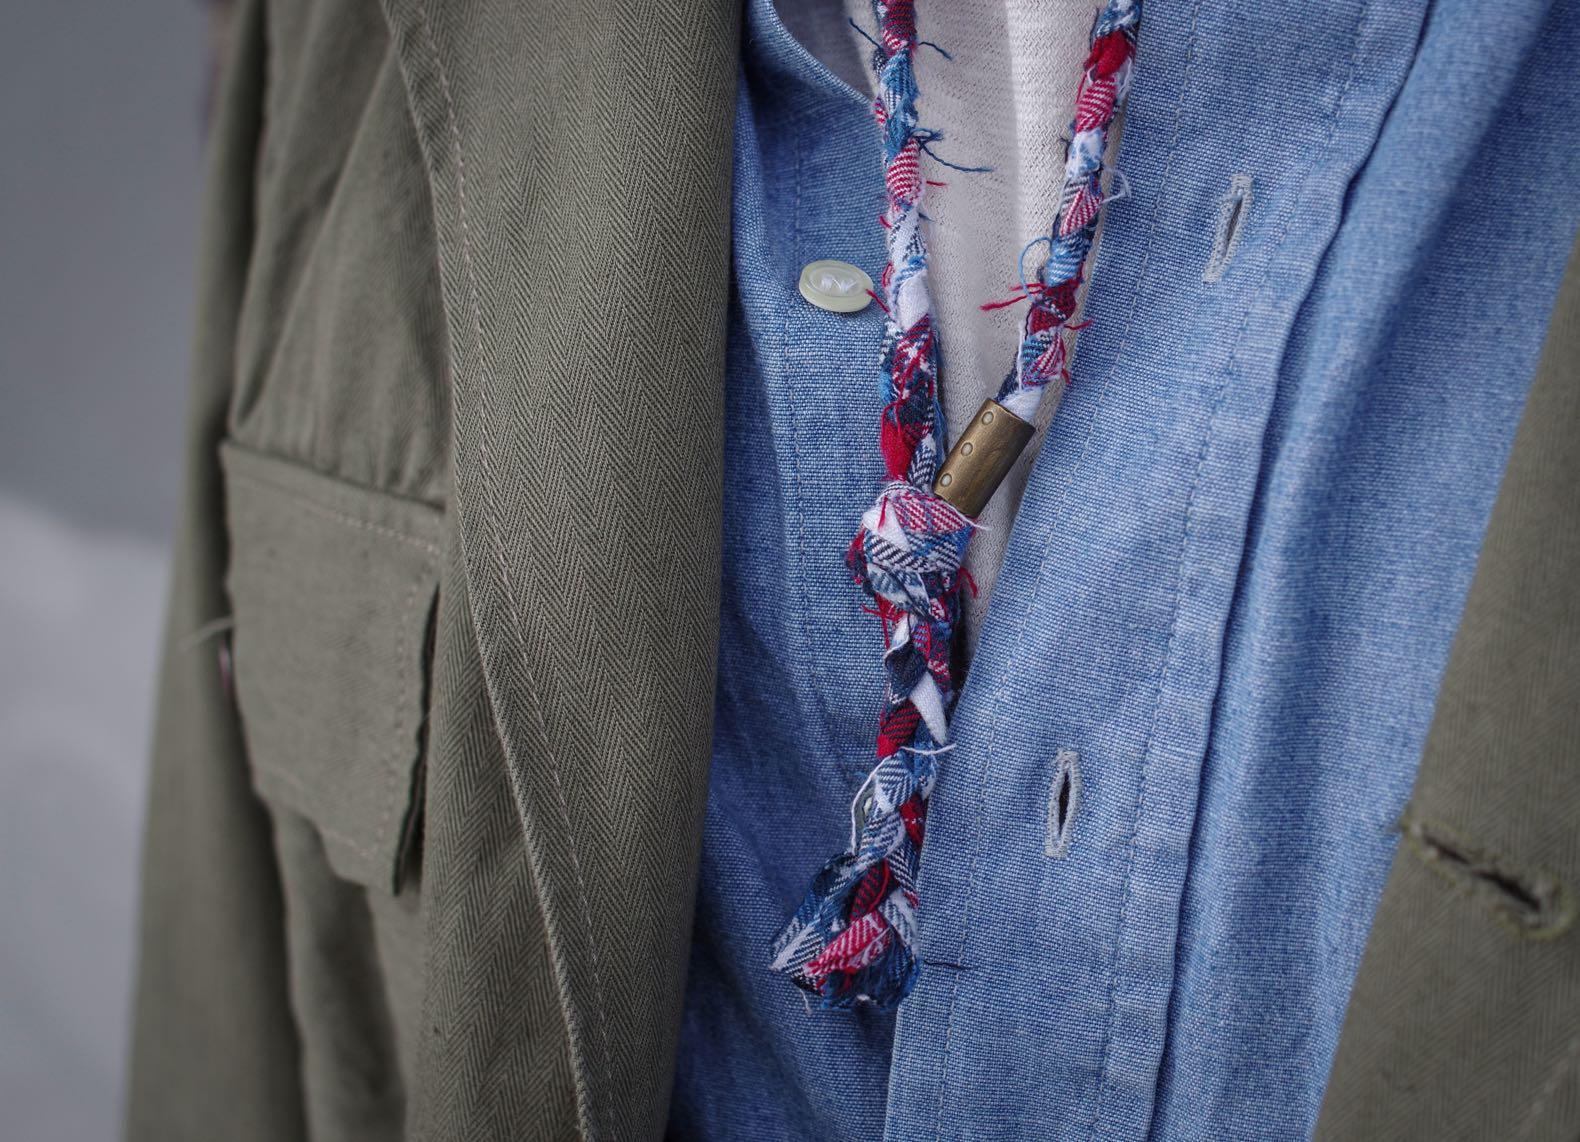 collier borali en tissu chmbray tressé et chemise en chambray